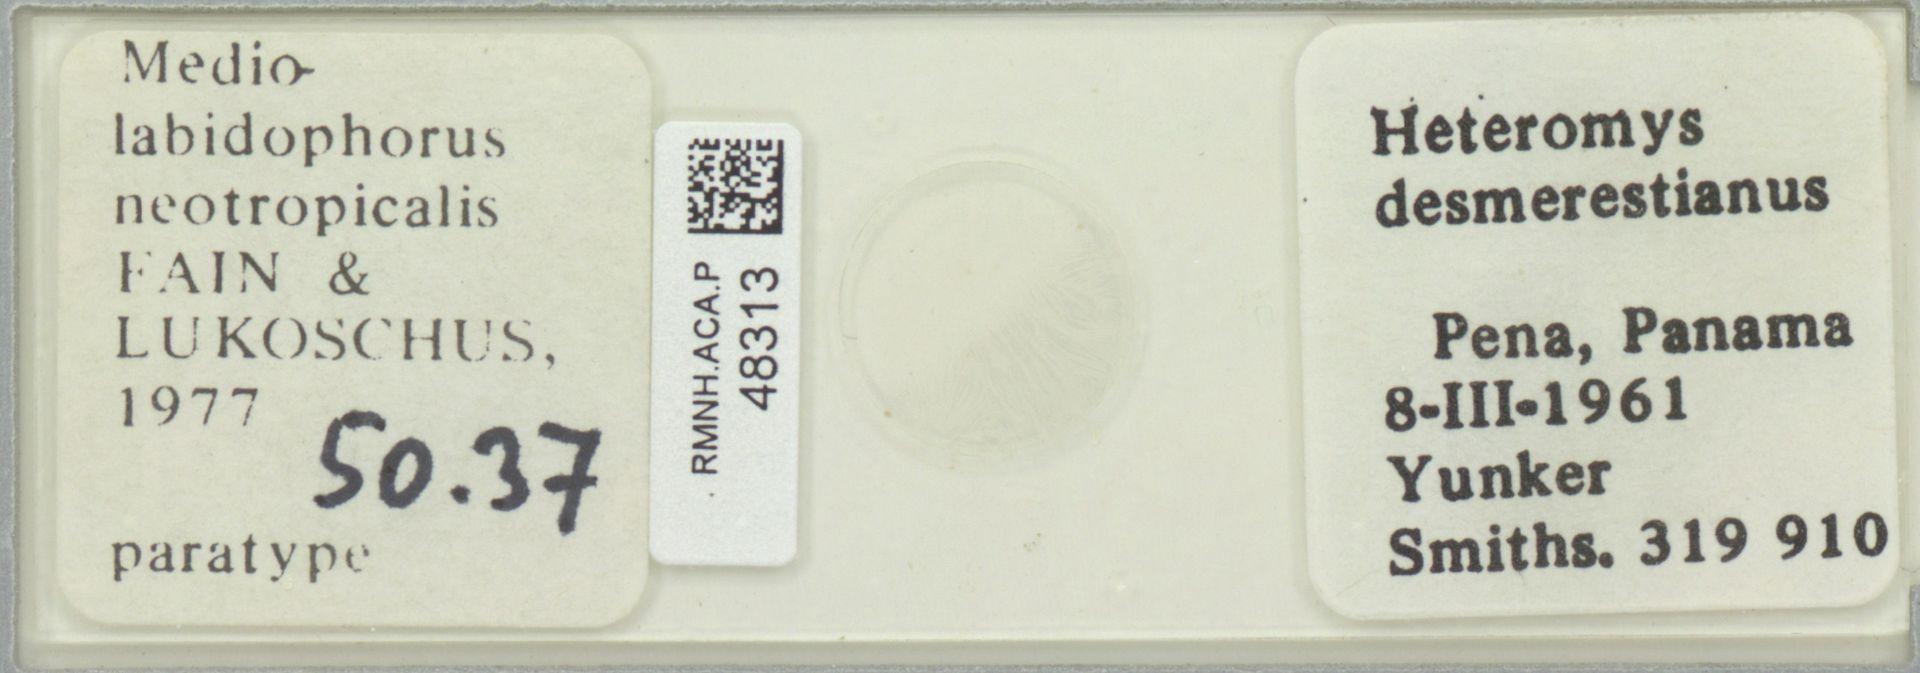 RMNH.ACA.P.48313 | Mediolabidophorus neotropicalis Fain & Lukoschus 1977